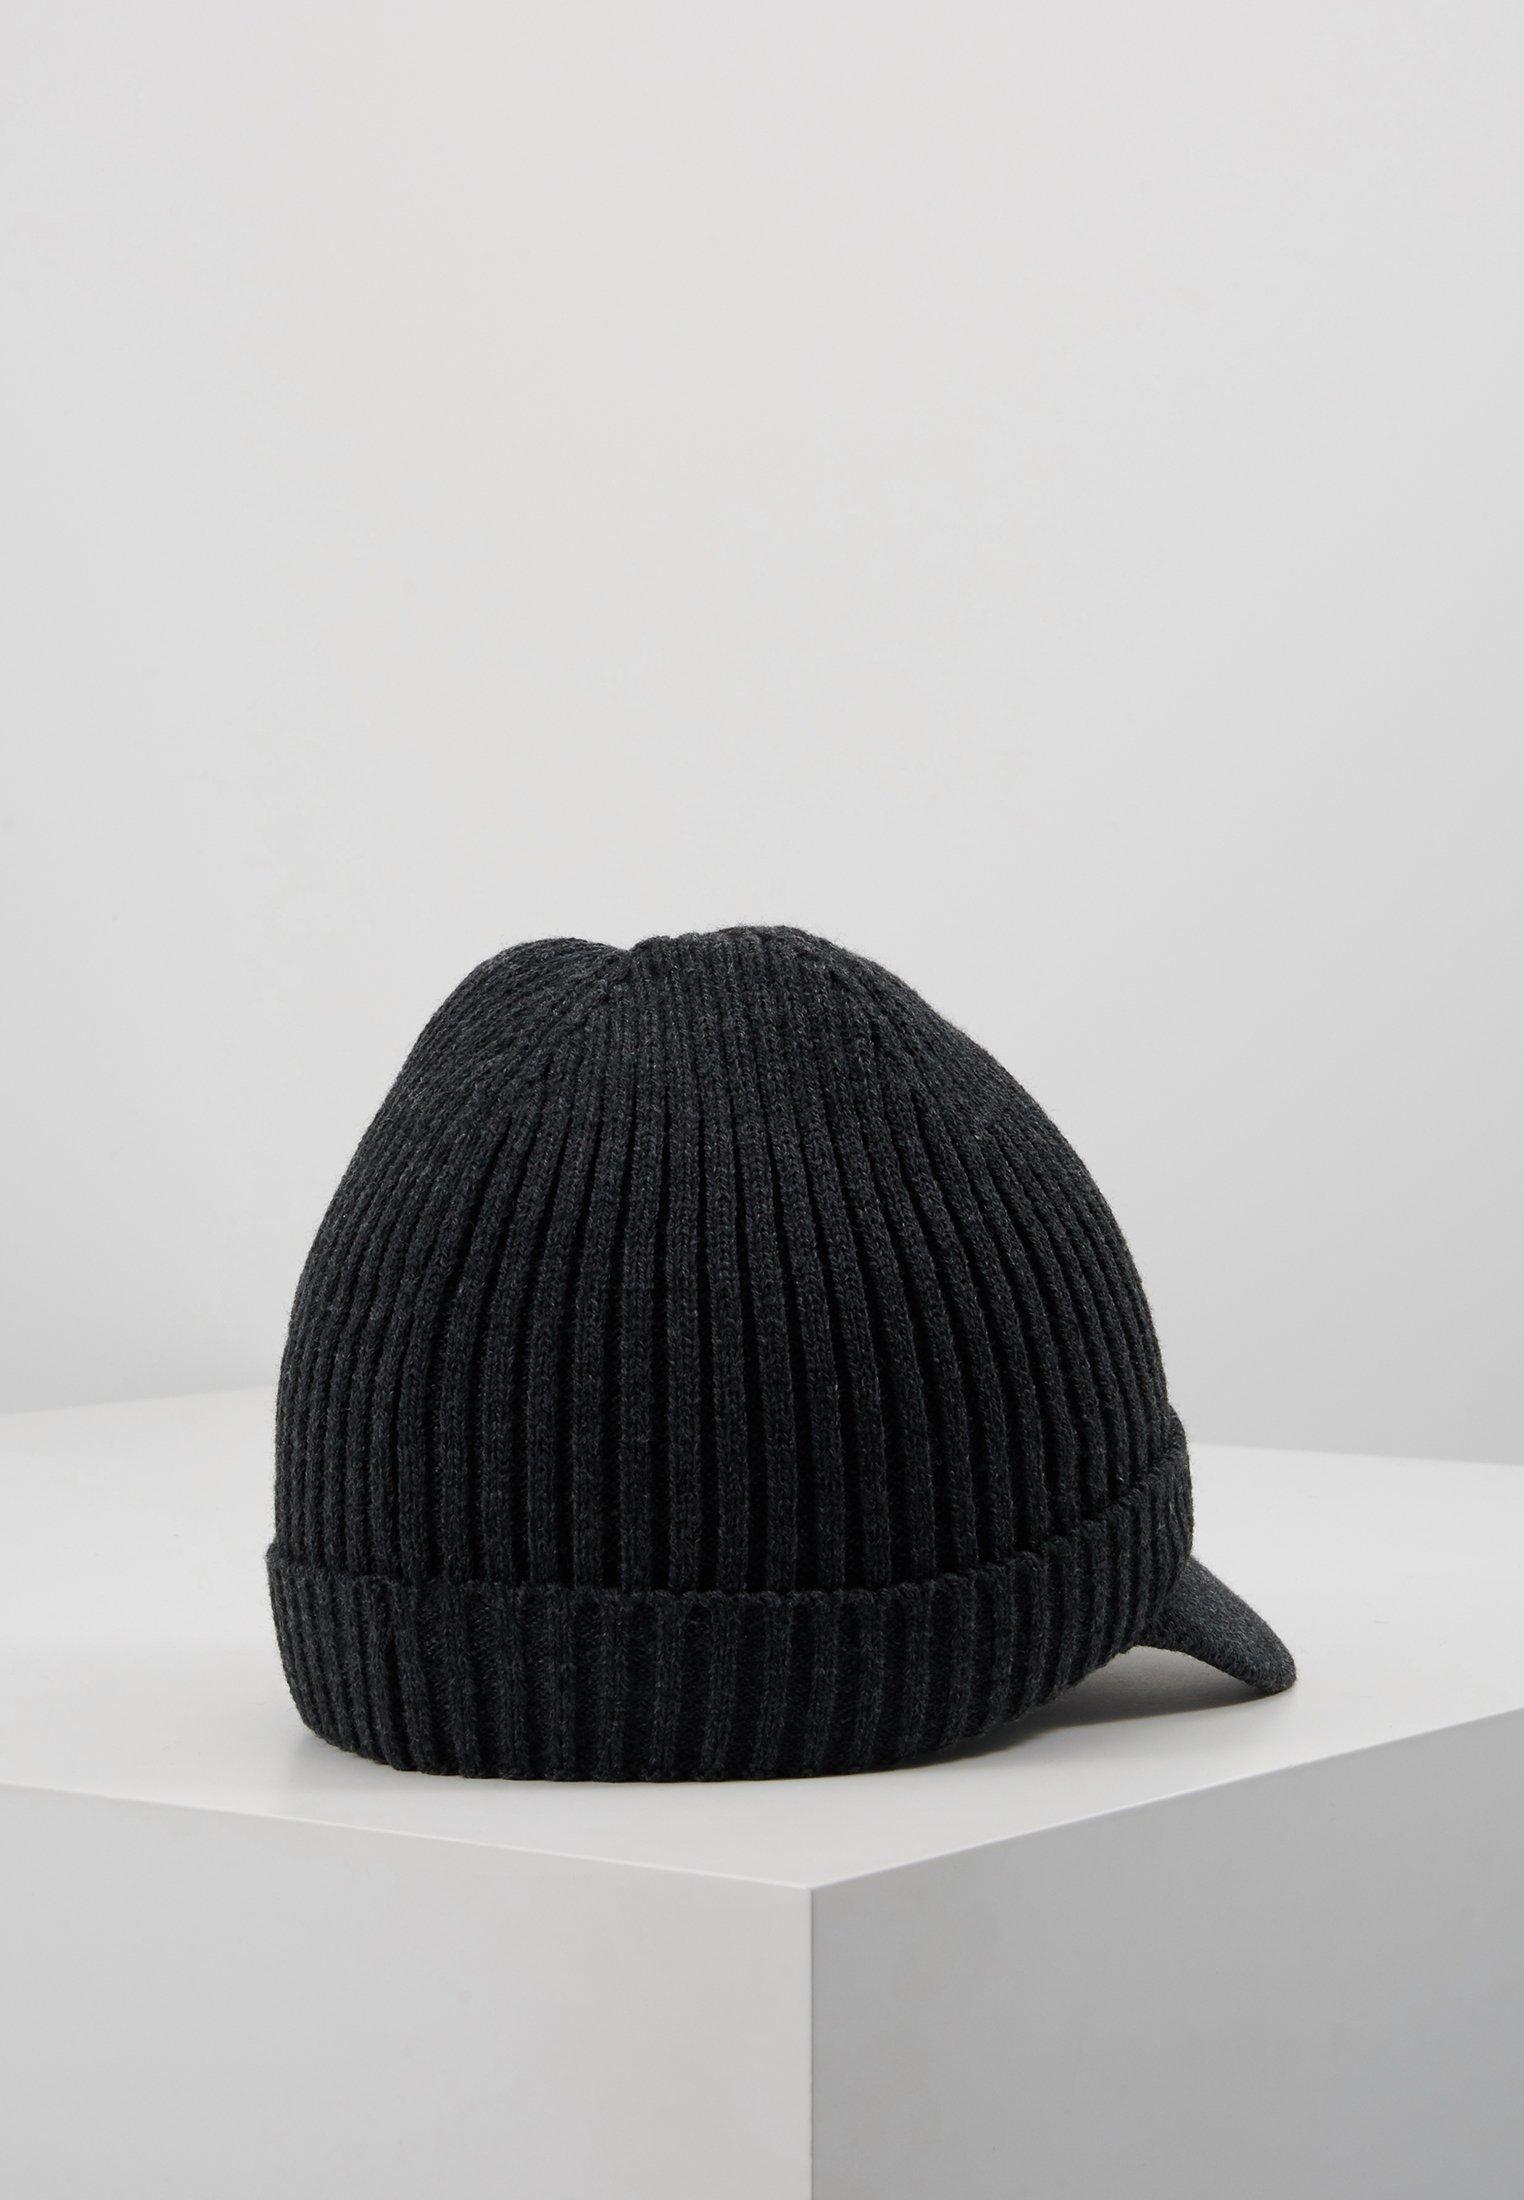 Chillouts BENNO - Lue - dark grey/mørkegrå 3RqKErvNtWlgAKW